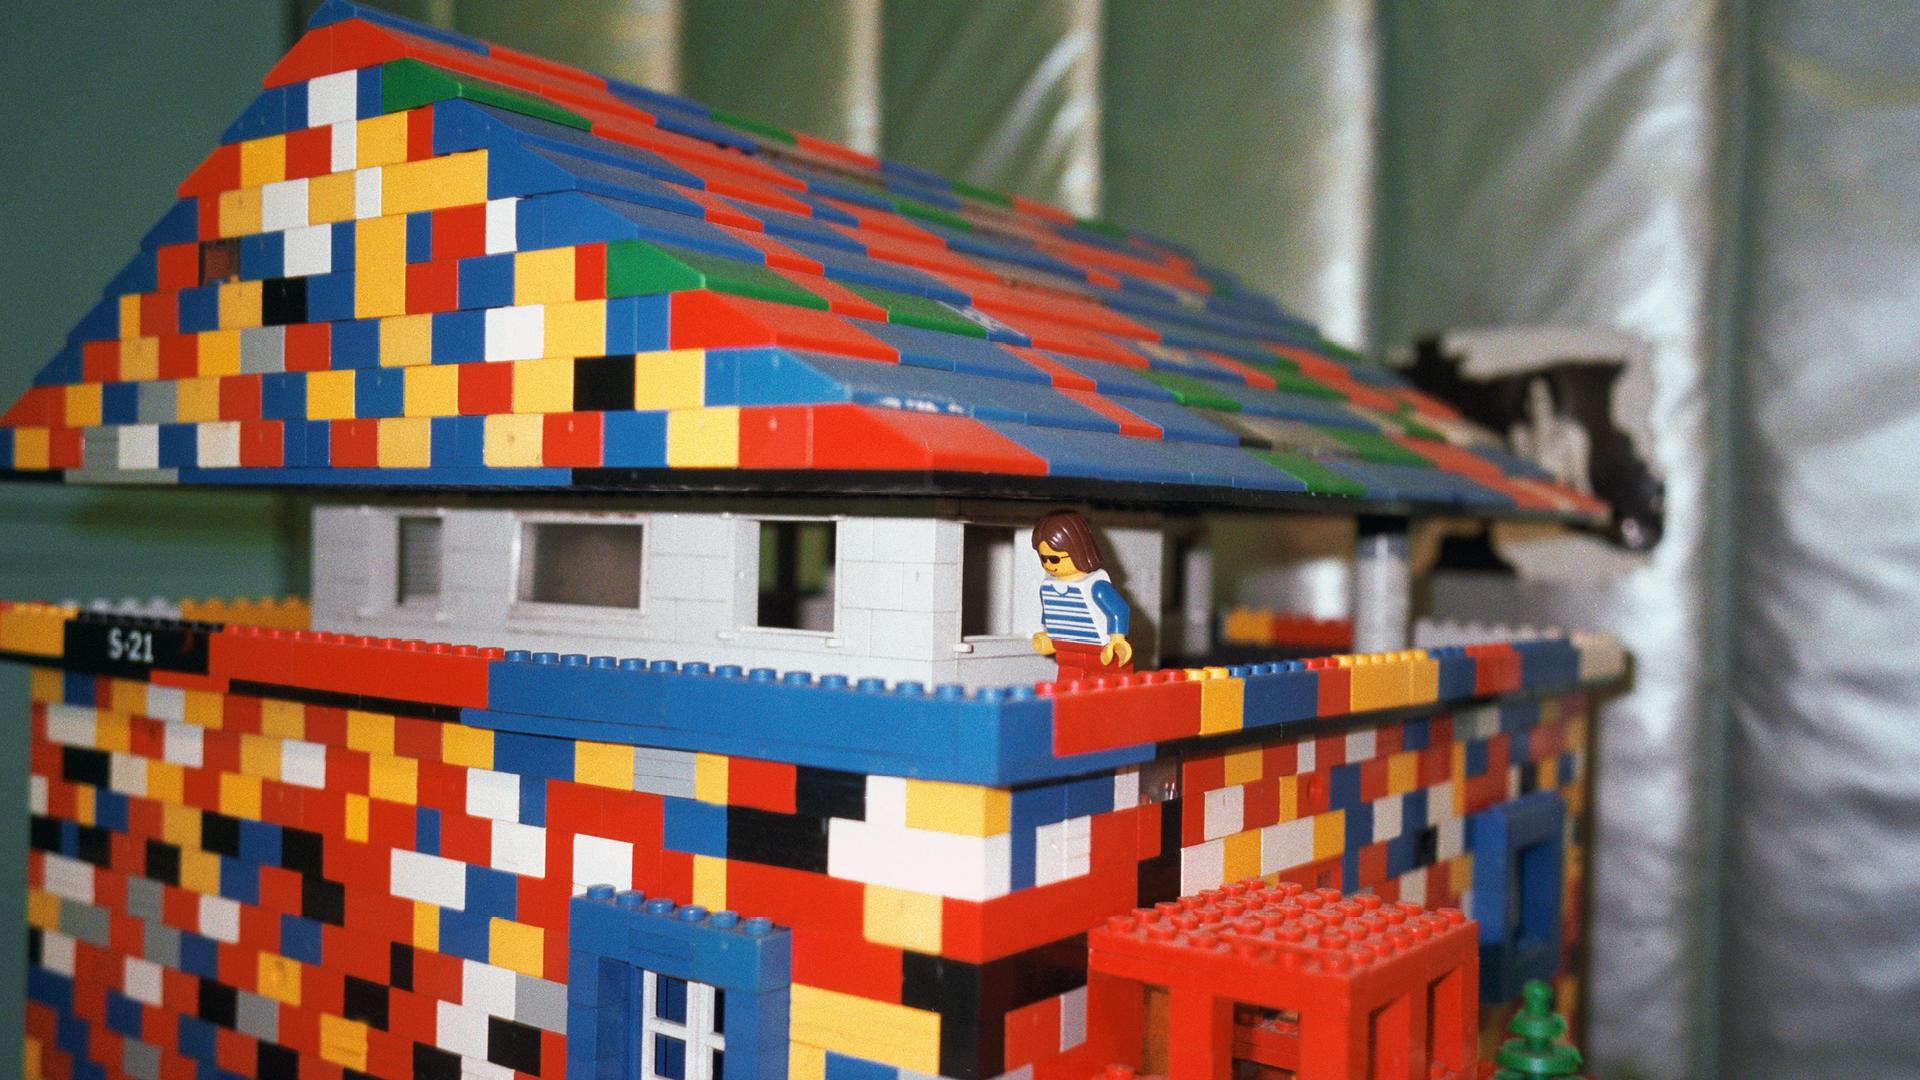 Ettore Sottsass, Lego house model in his studio, Milan, Italy, 1999 | Blind Sensorium. Il Paradosso dell'Antropocene | Armin Linke | STIRworld